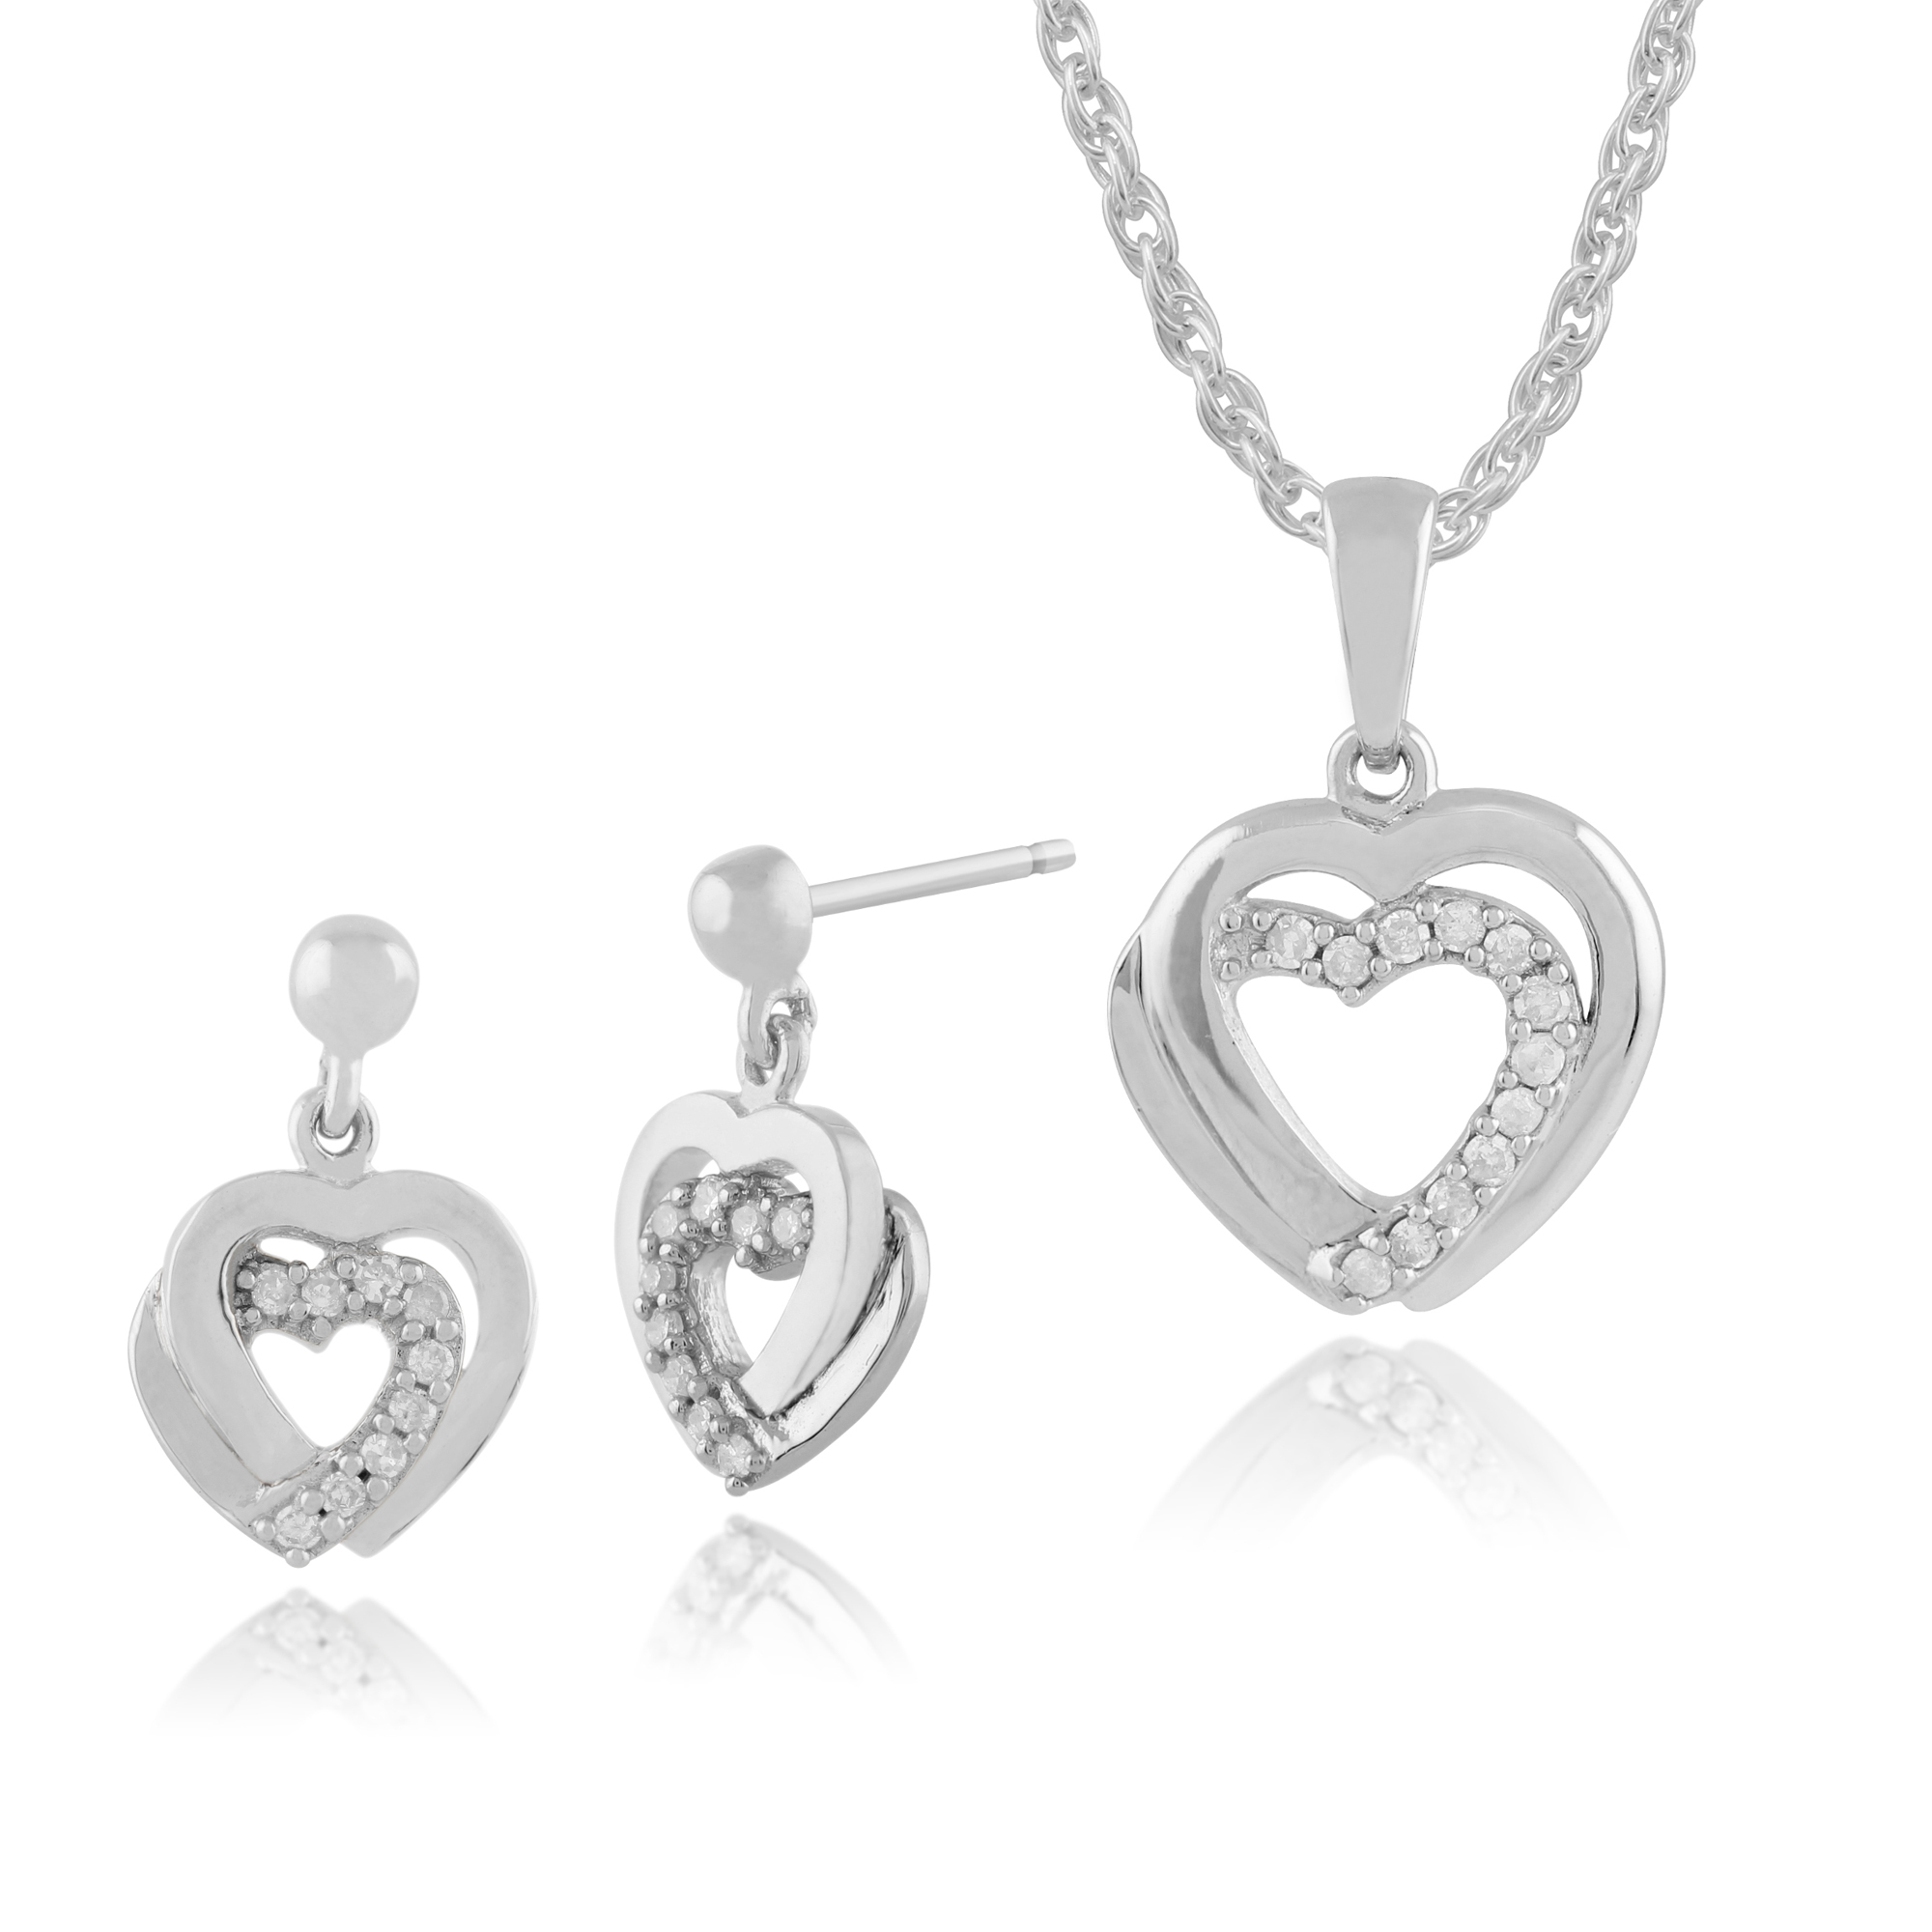 Gemondo 9ct White Gold Diamond Hearts Drop Earrings & 45cm Necklace Set